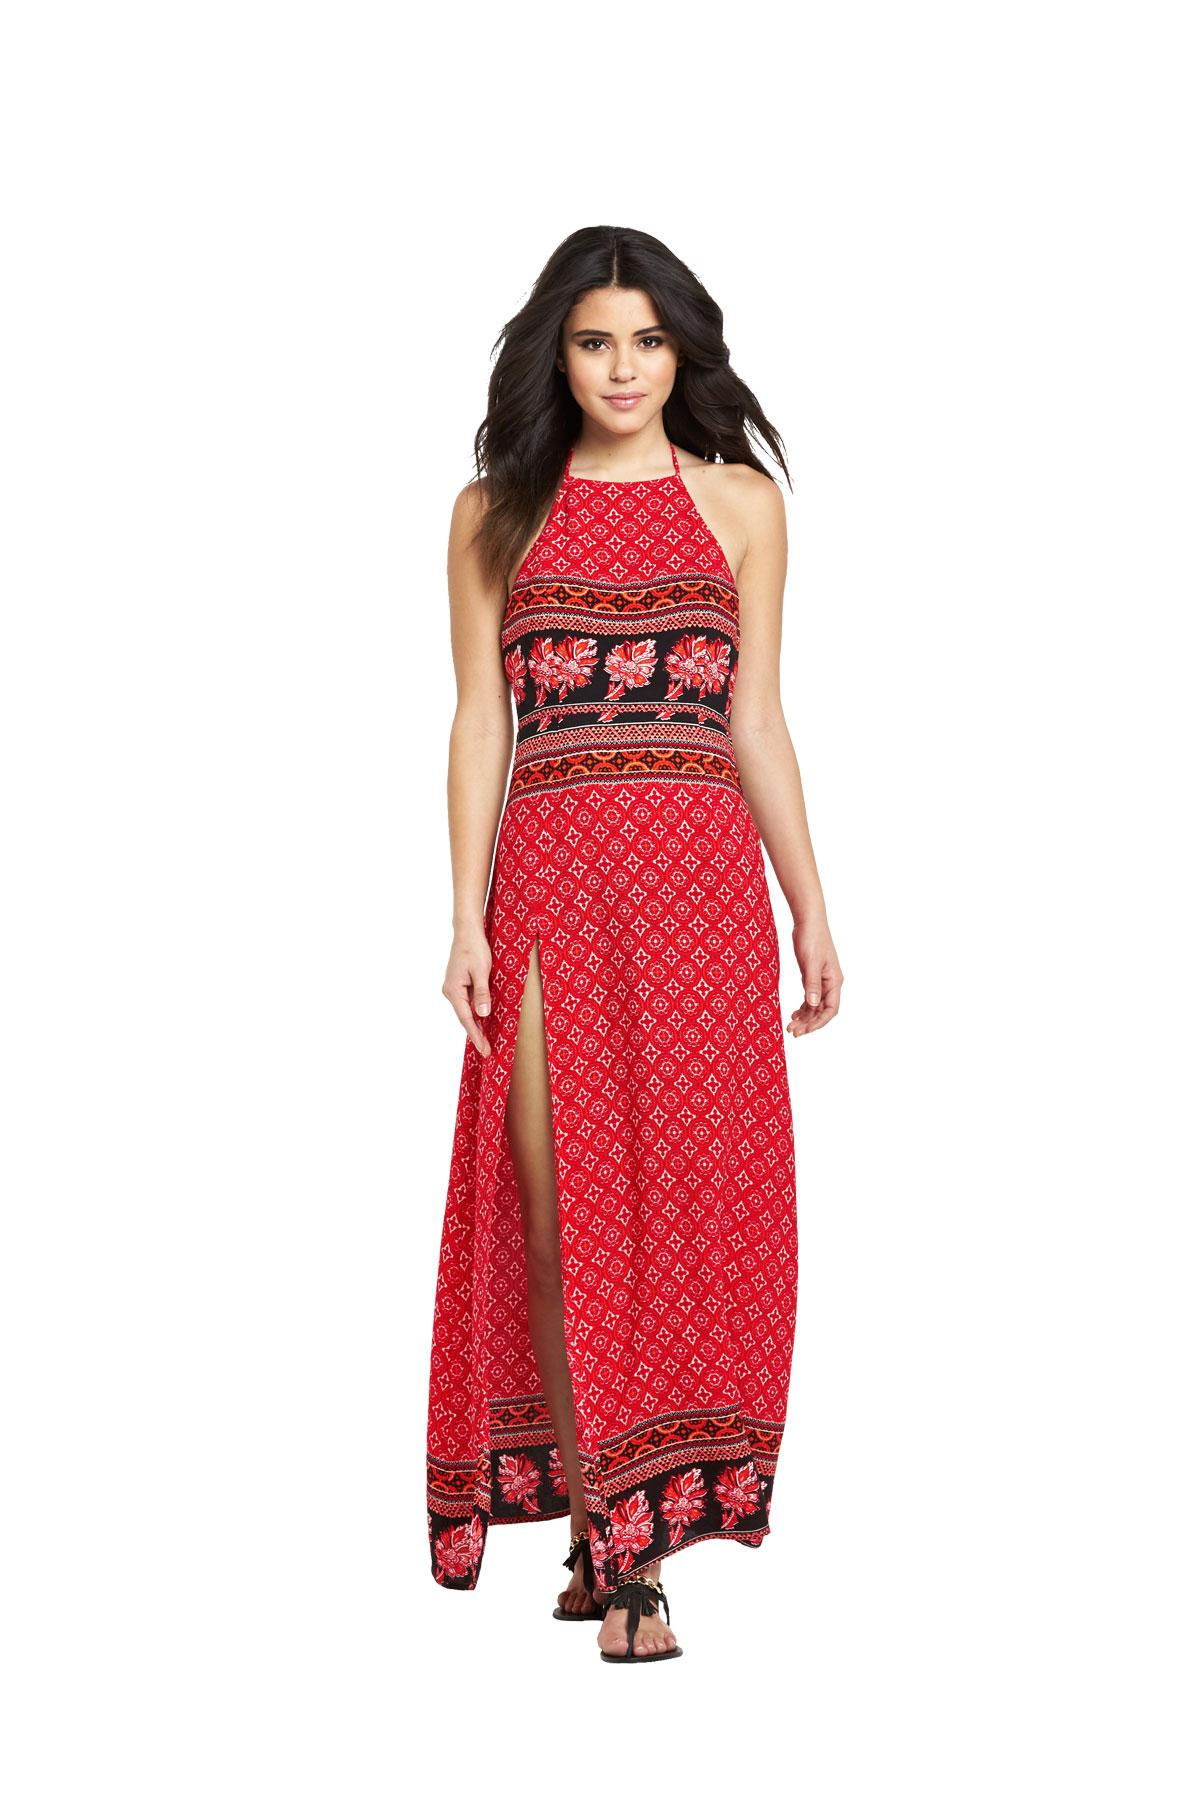 Mink Pink Spice Market Halter Maxi Dress.